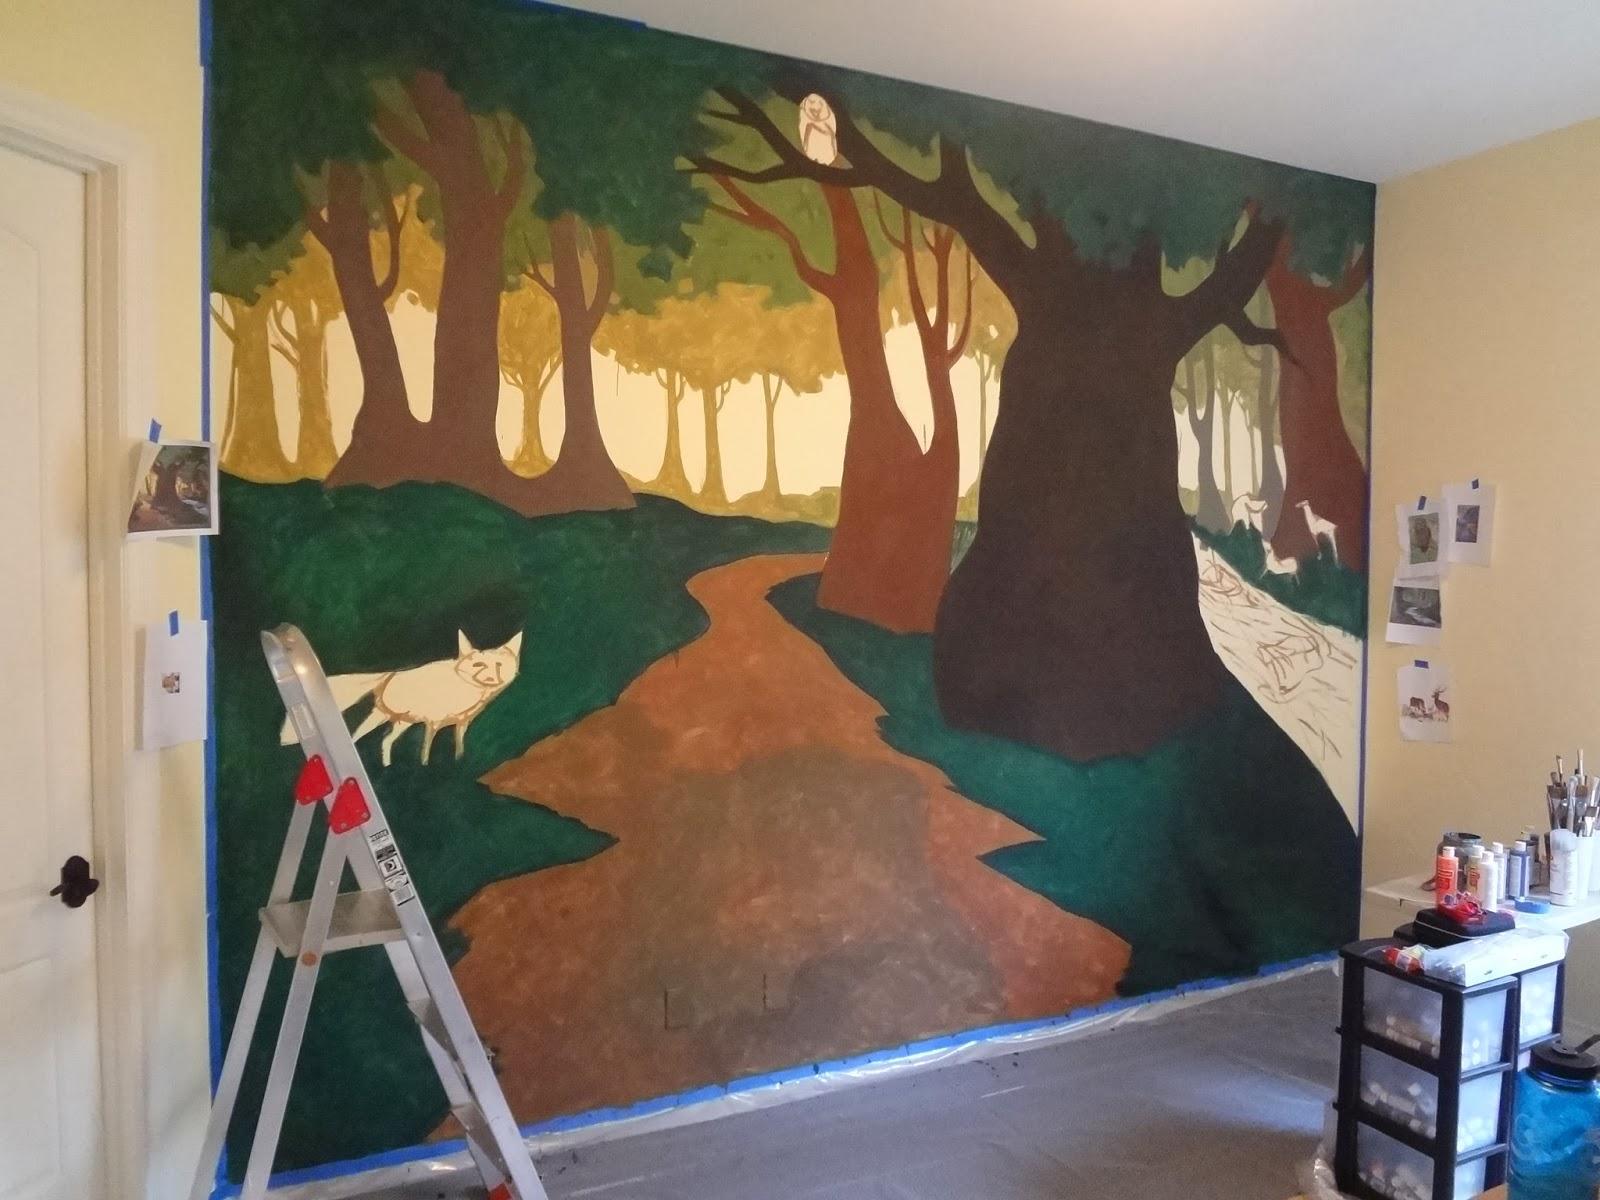 forest nursery mural, portland oregon muralist, kids room murals portland